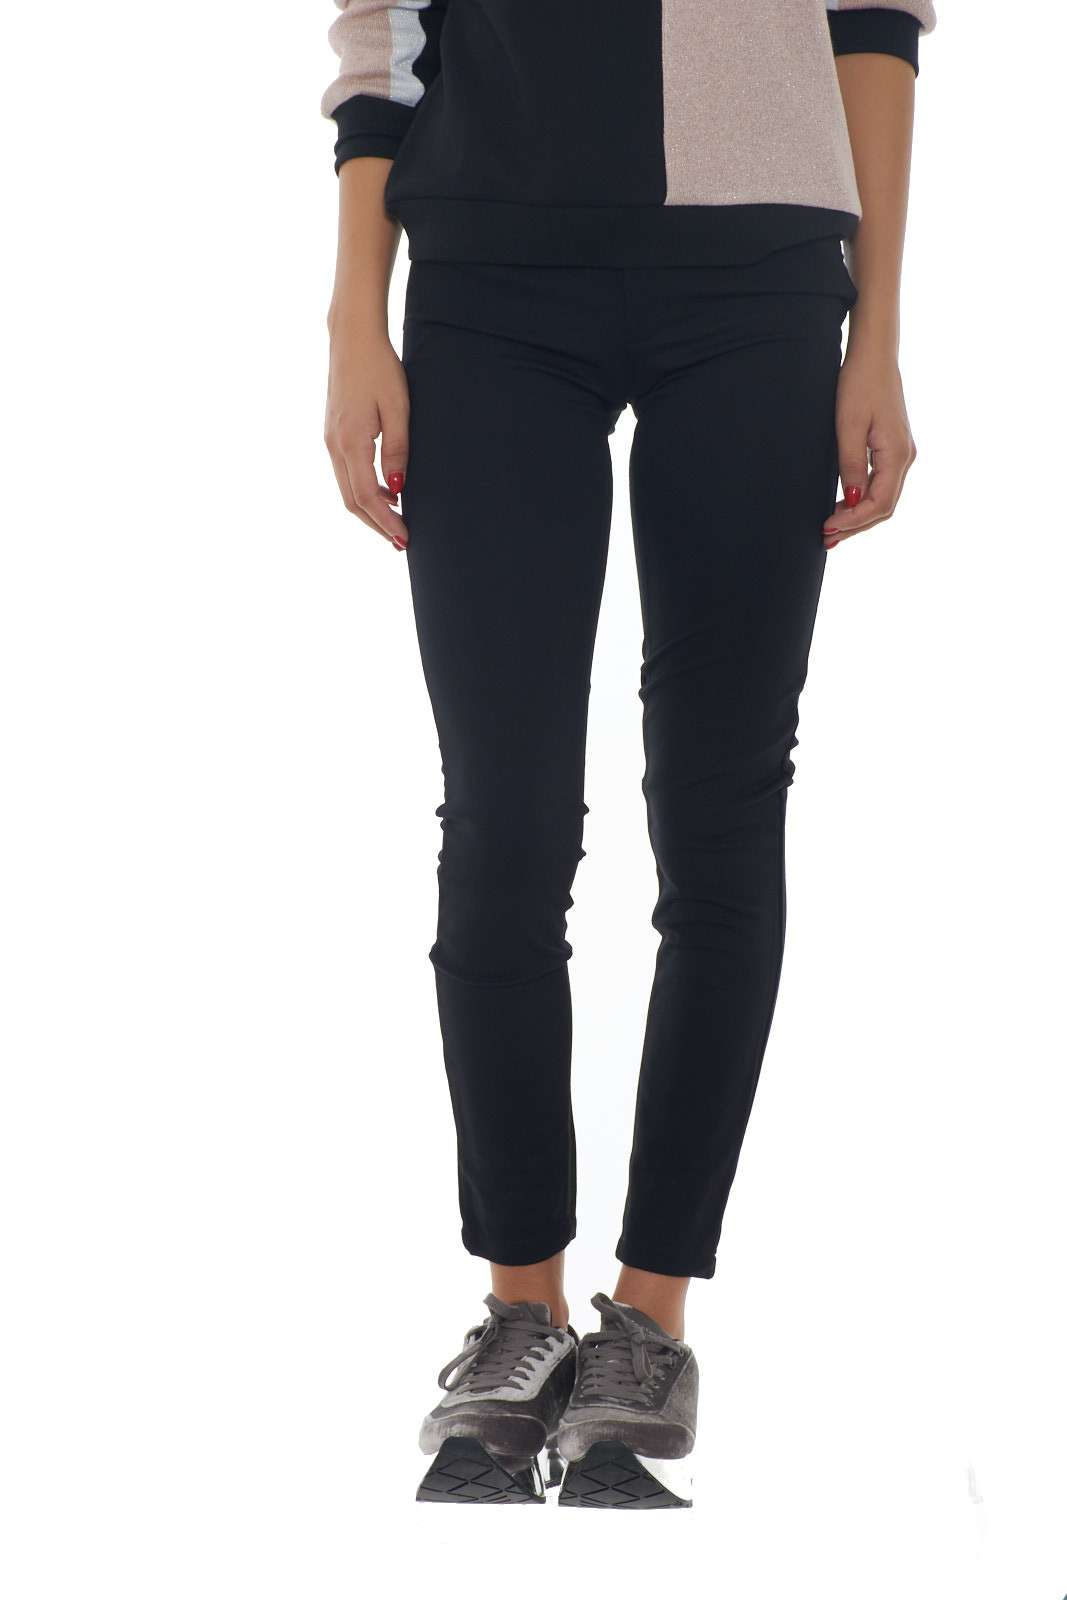 https://www.parmax.com/media/catalog/product/a/i/AI-outlet_parmax-pantaloni-donna-Liu-Jo-T69033-A.jpg